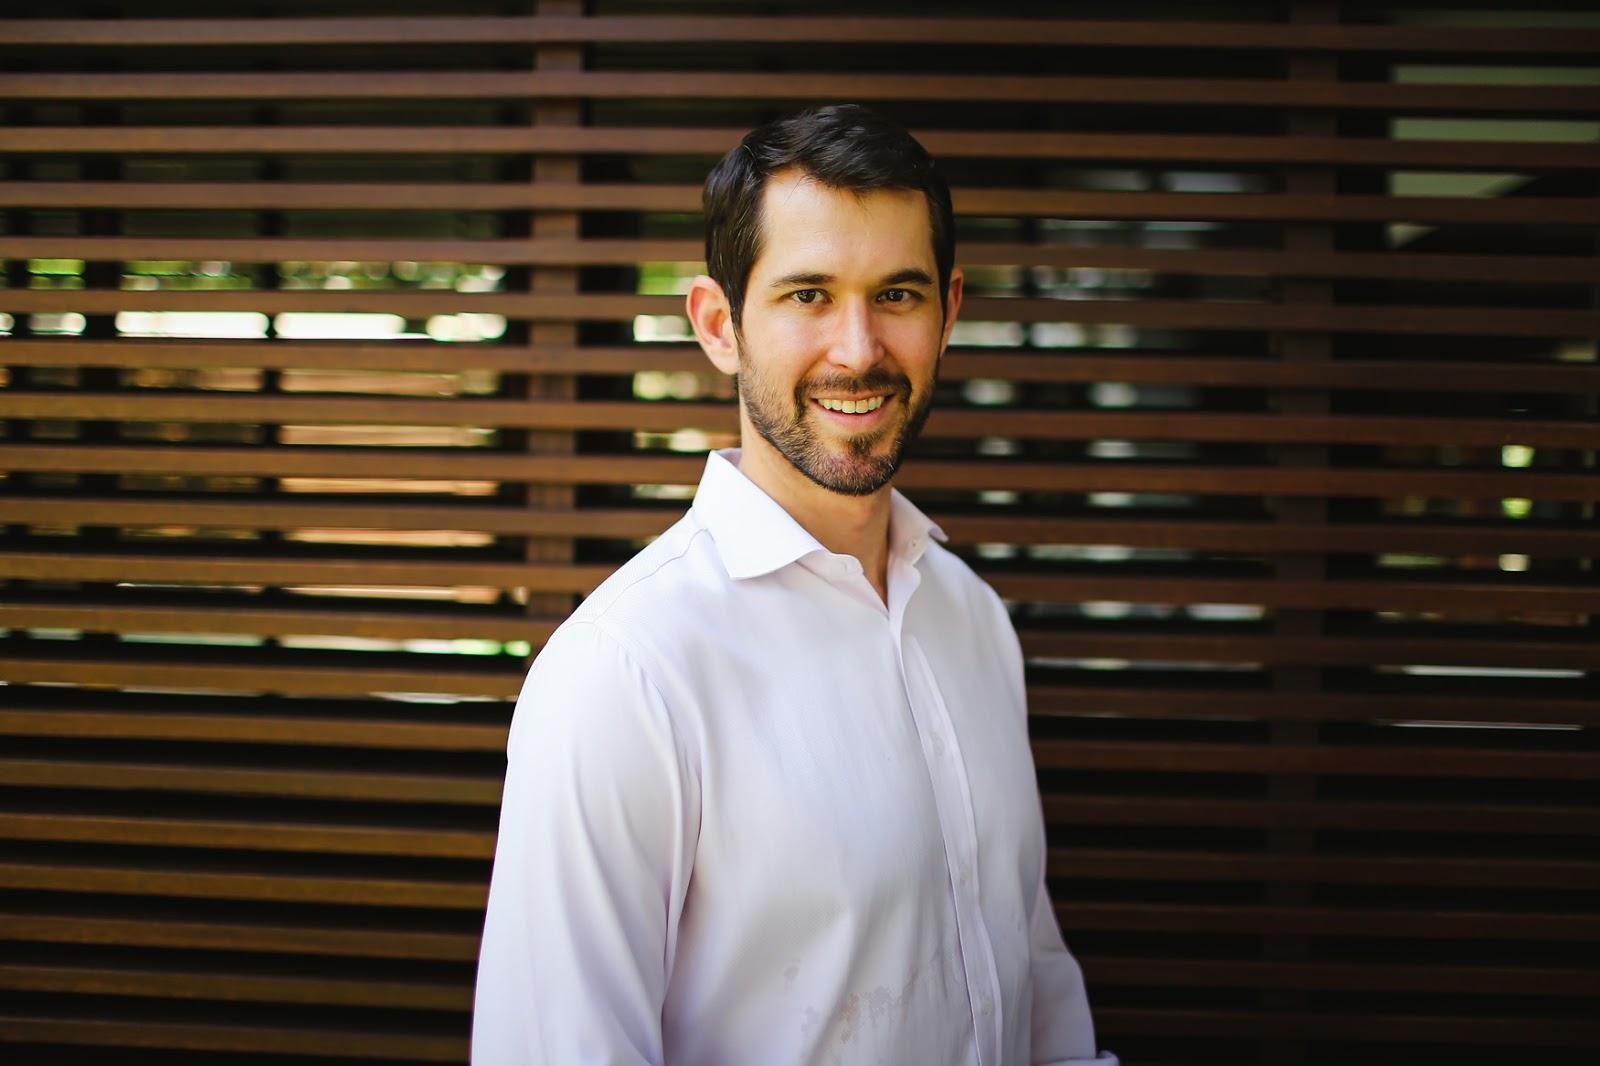 Josh Ziegler, CEO of ZUMATA